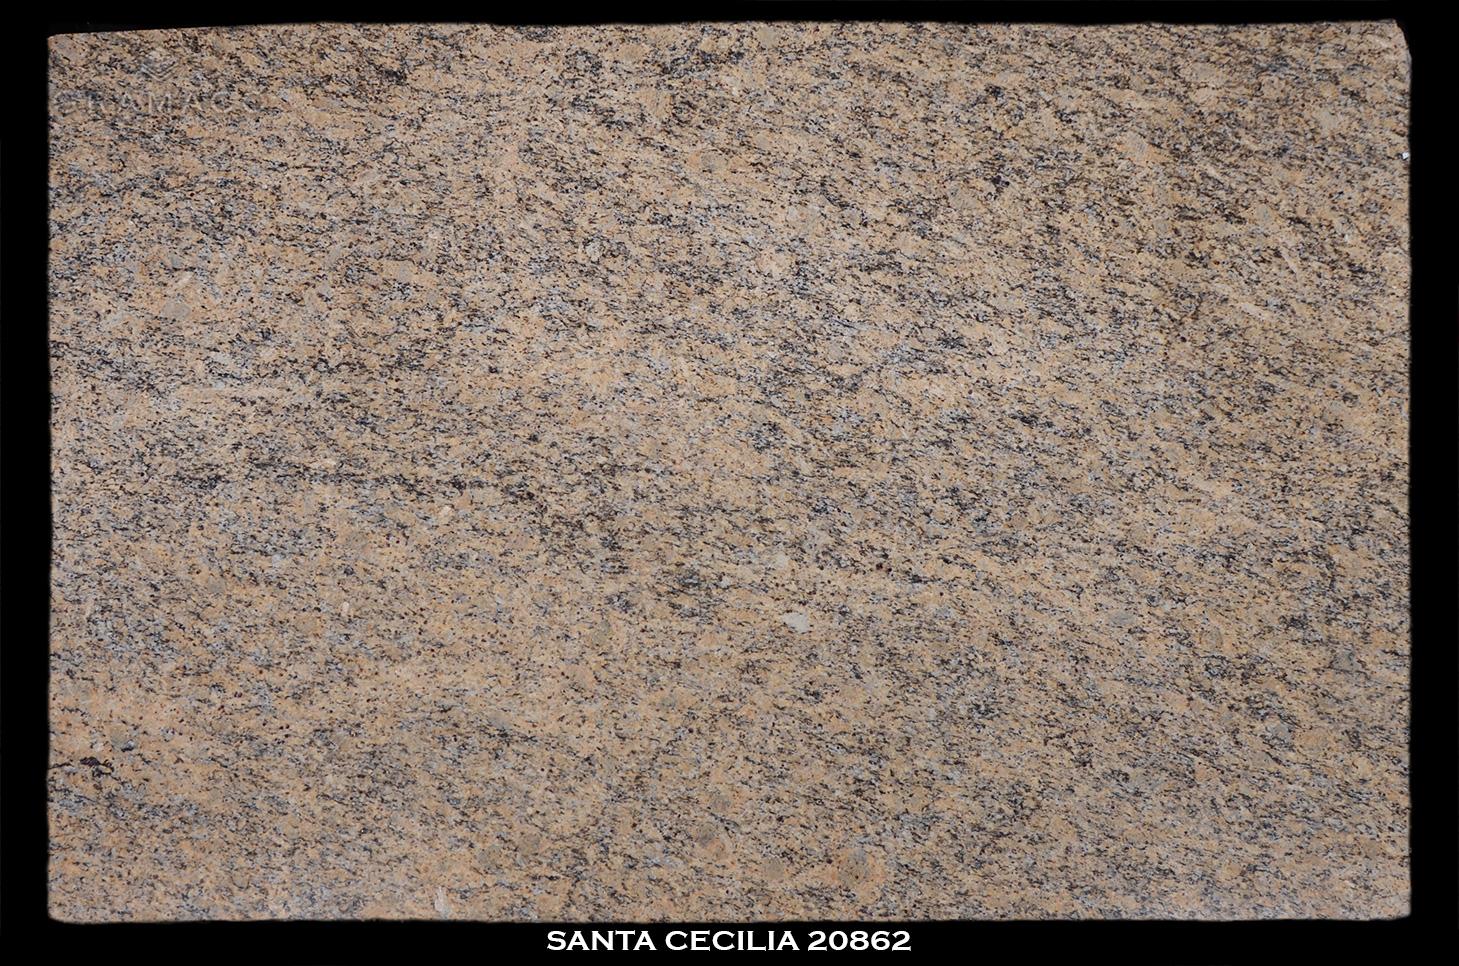 SANTA-CECILIA-20862-slab